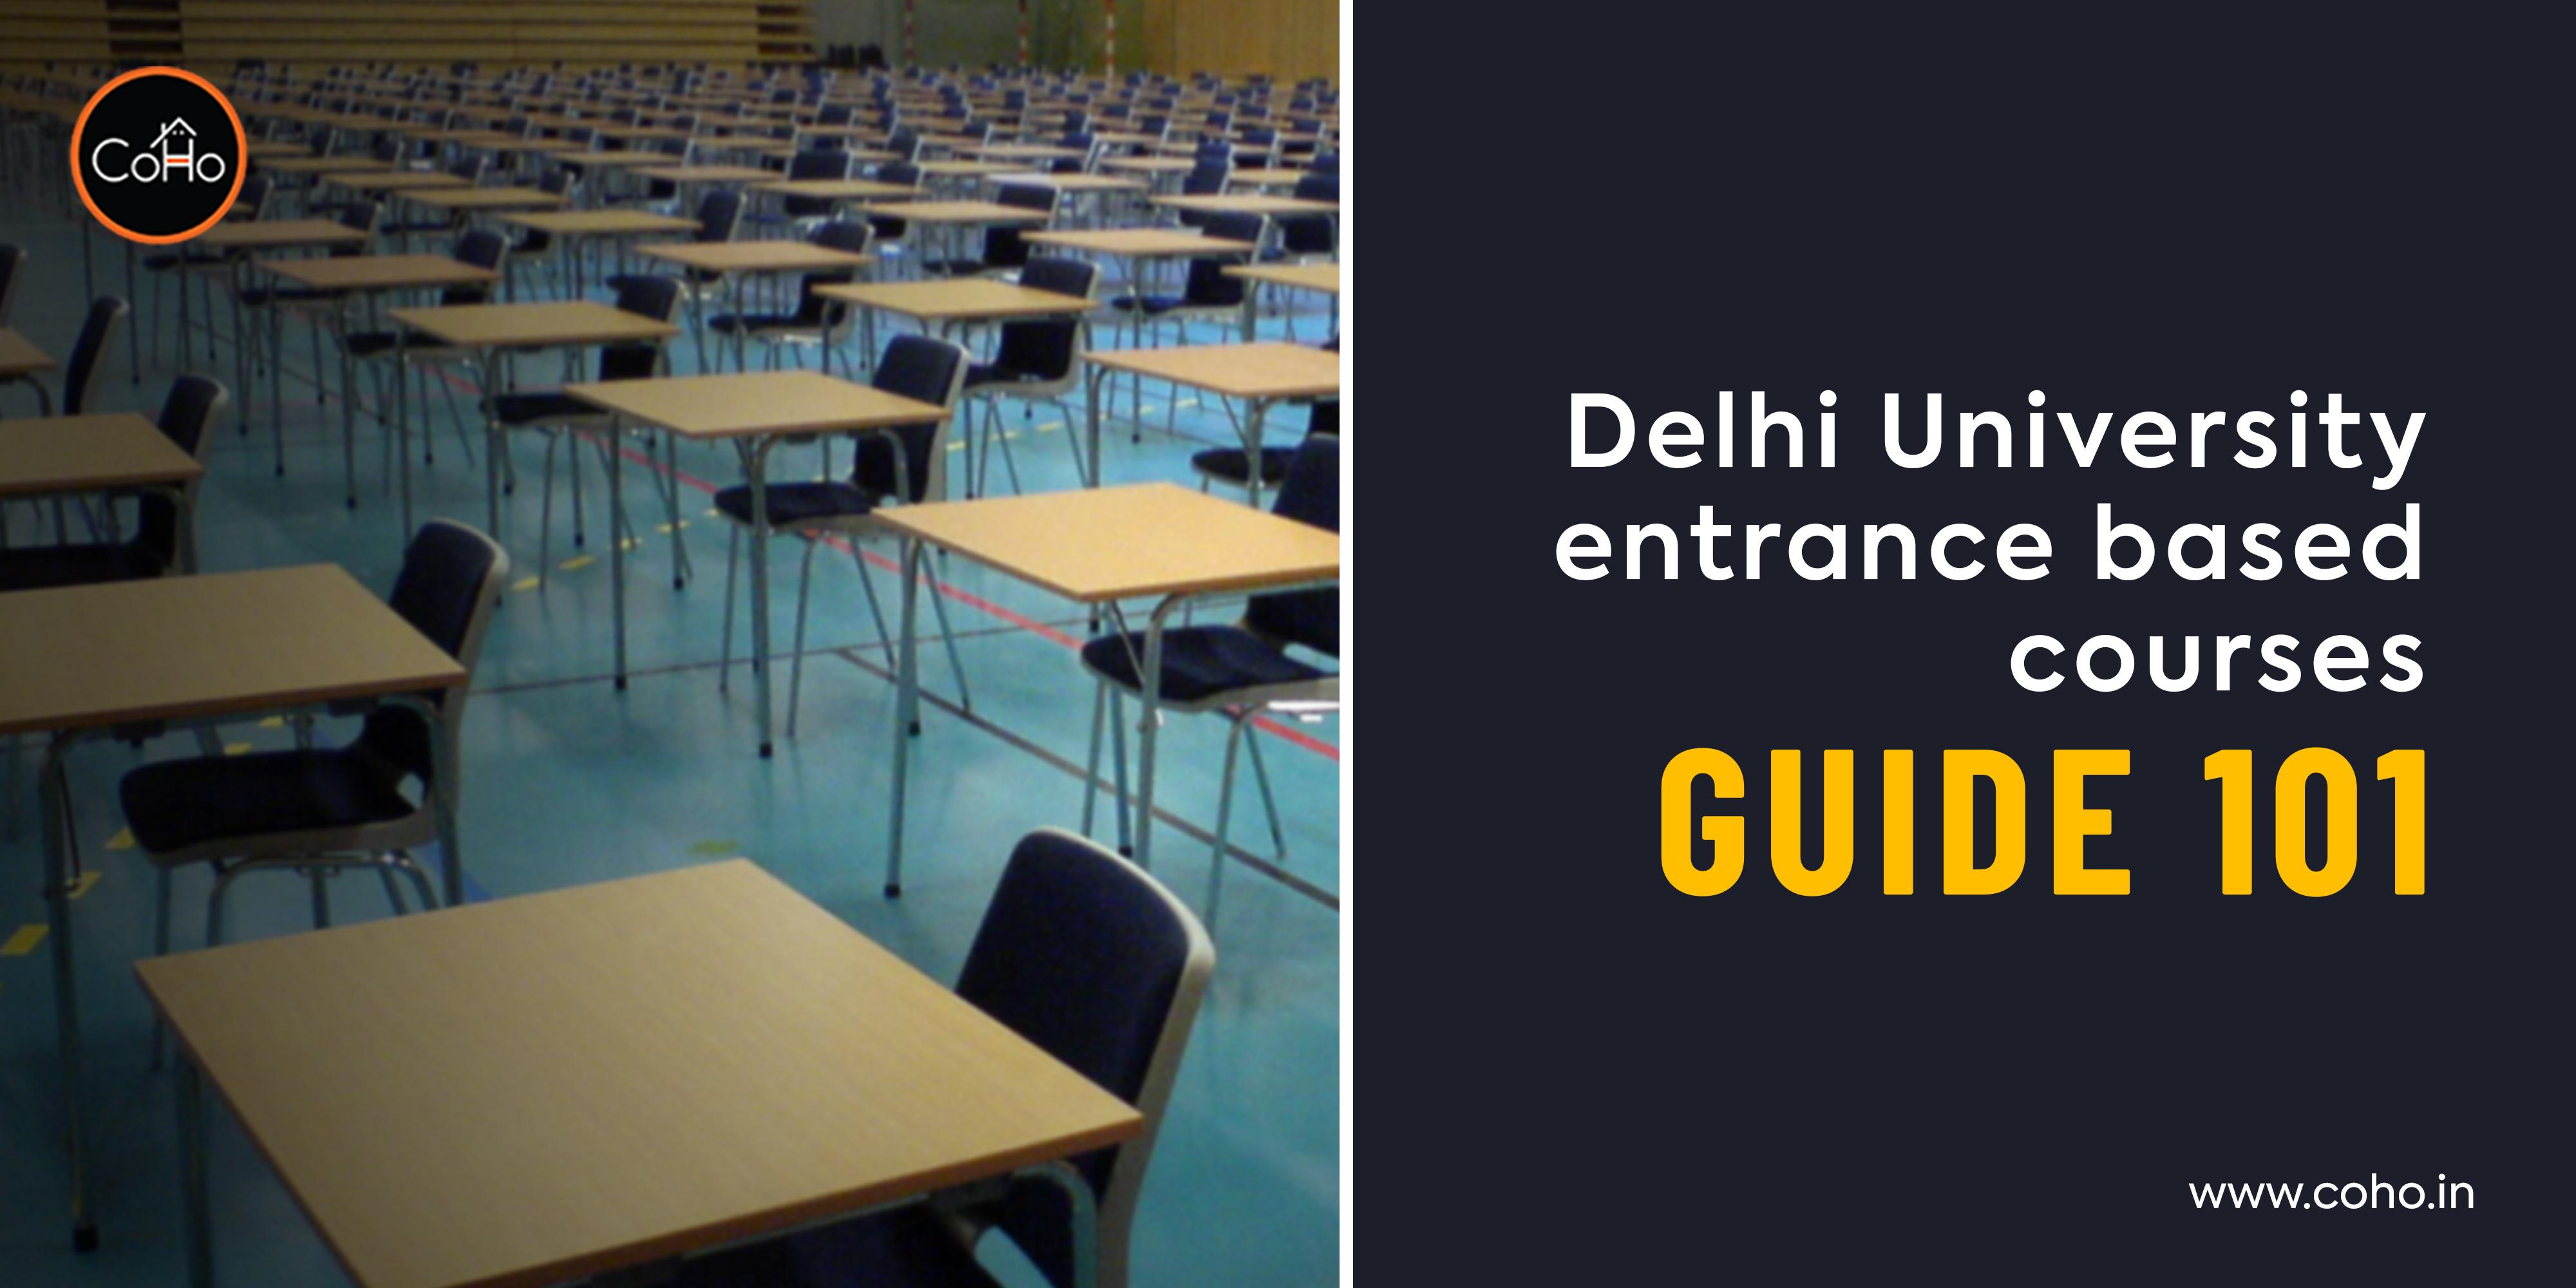 Delhi University entrance based courses Guide 101